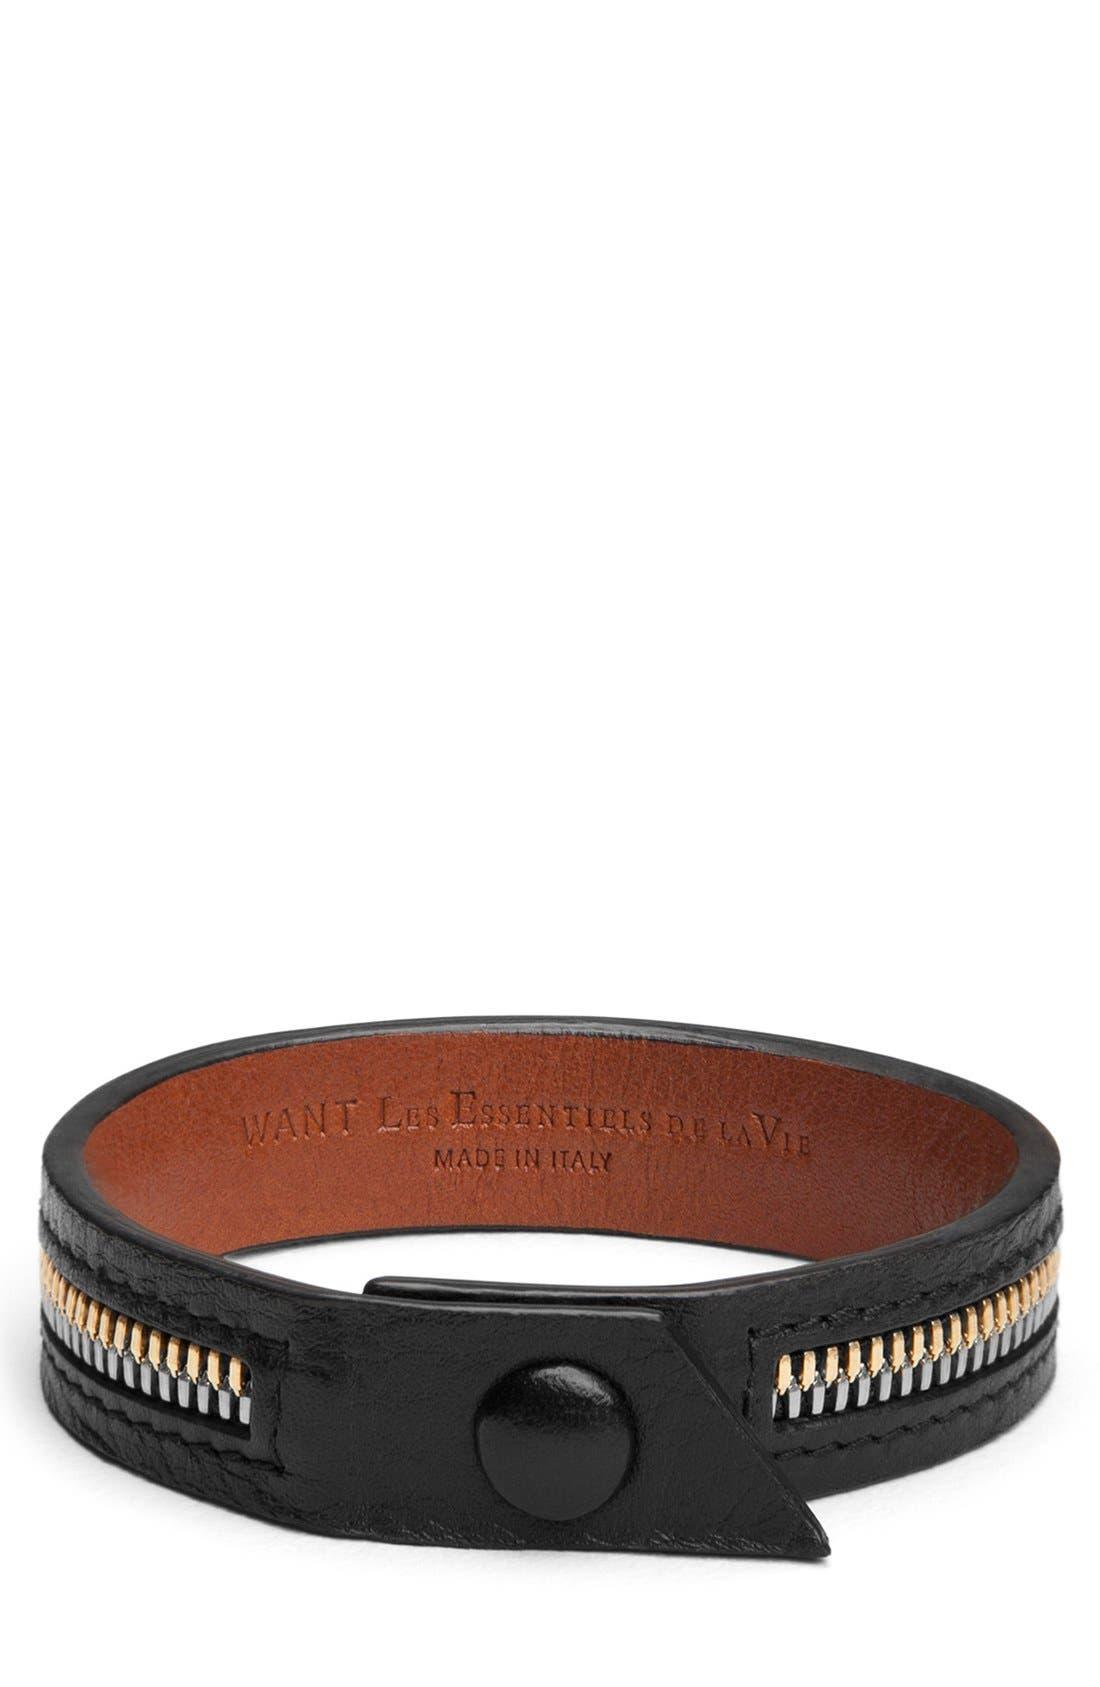 Main Image - WANT LES ESSENTIELS 'Tambo' Zip Bracelet